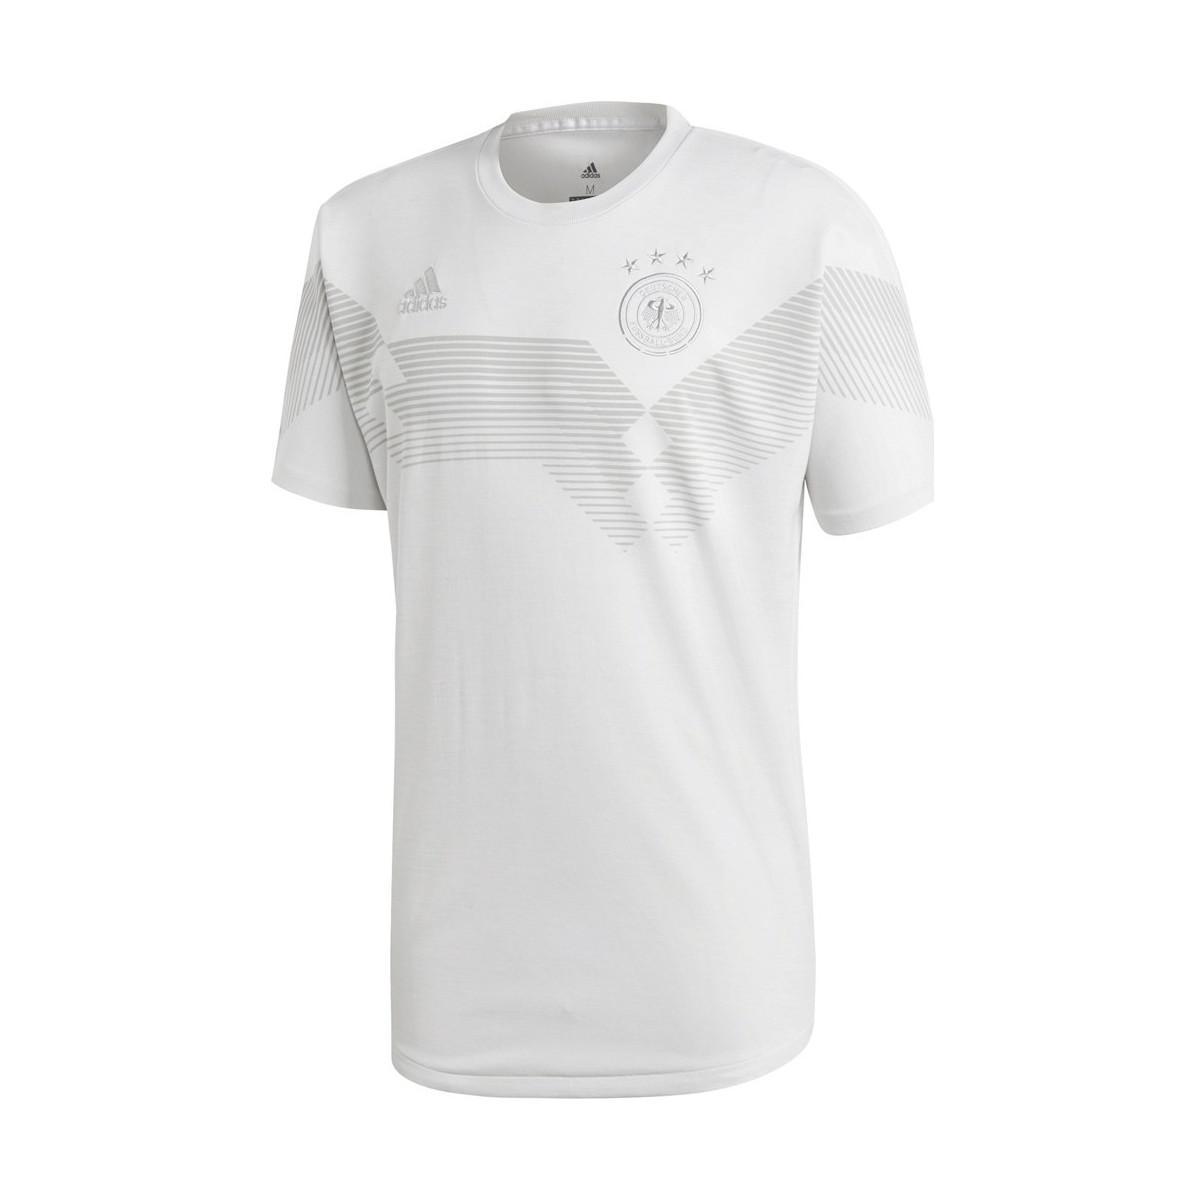 43cd5251f adidas. 2018-2019 Germany Seasonal Special Tee Women s T Shirt In White